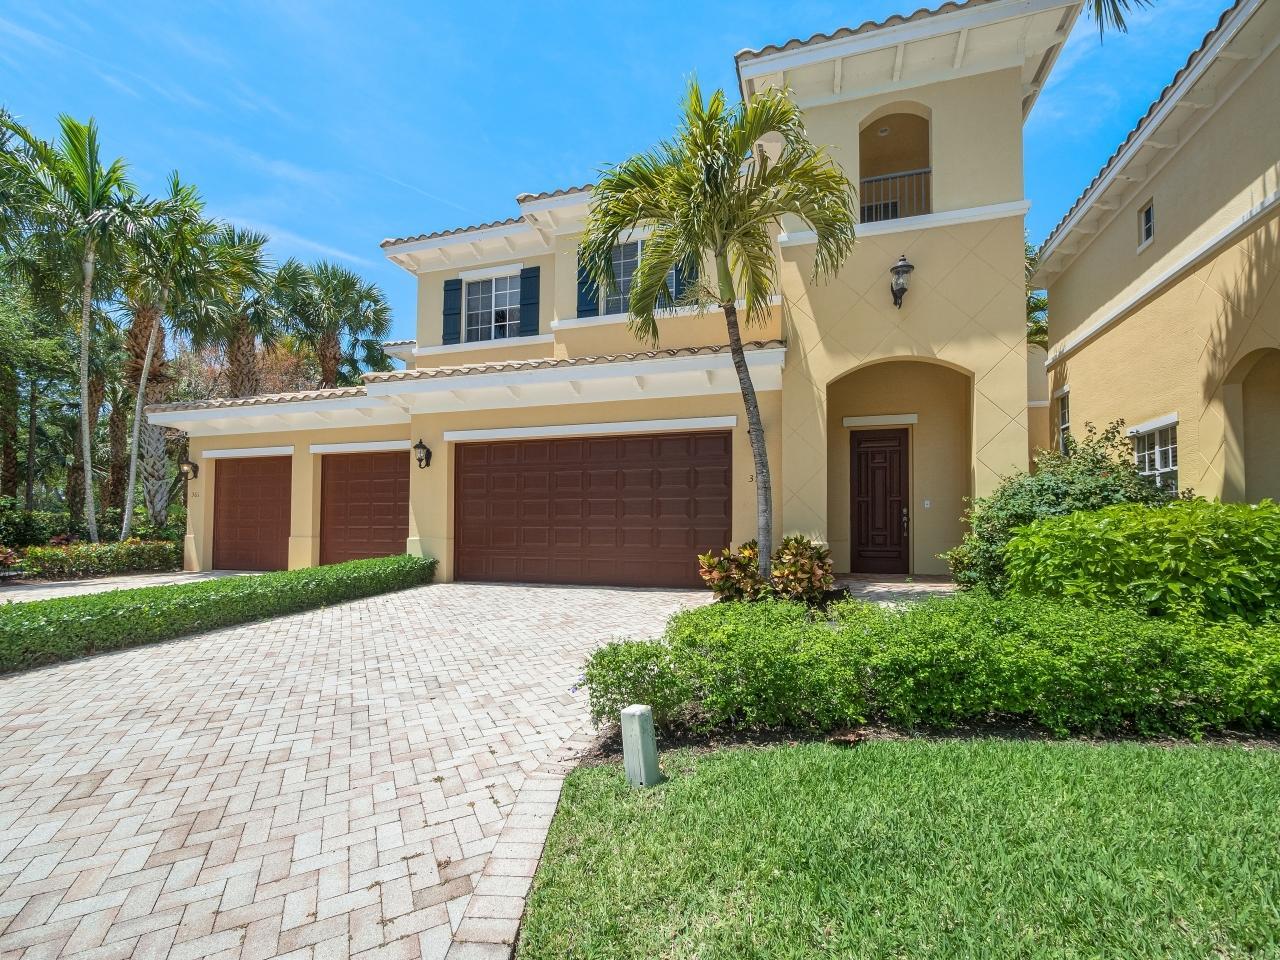 359 Chambord Terrace, Palm Beach Gardens, Florida 33410, 2 Bedrooms Bedrooms, ,2.1 BathroomsBathrooms,A,Condominium,Chambord,RX-10708464